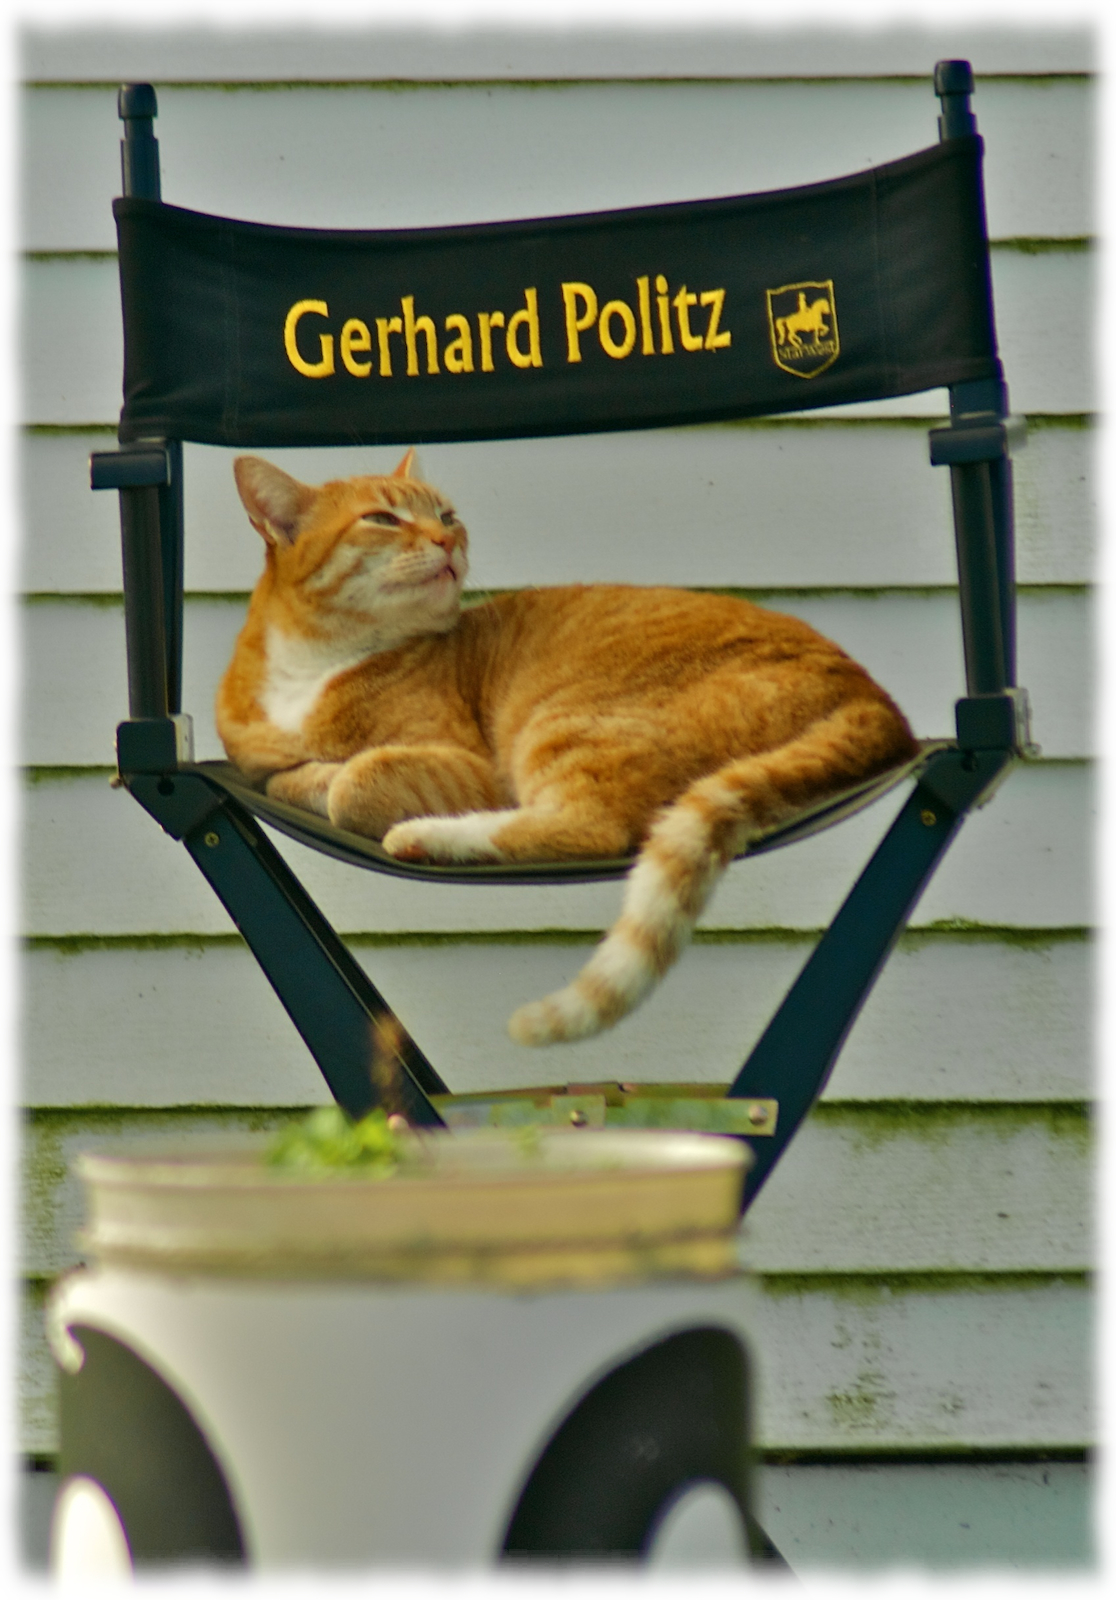 (Not Gerhard Politz)